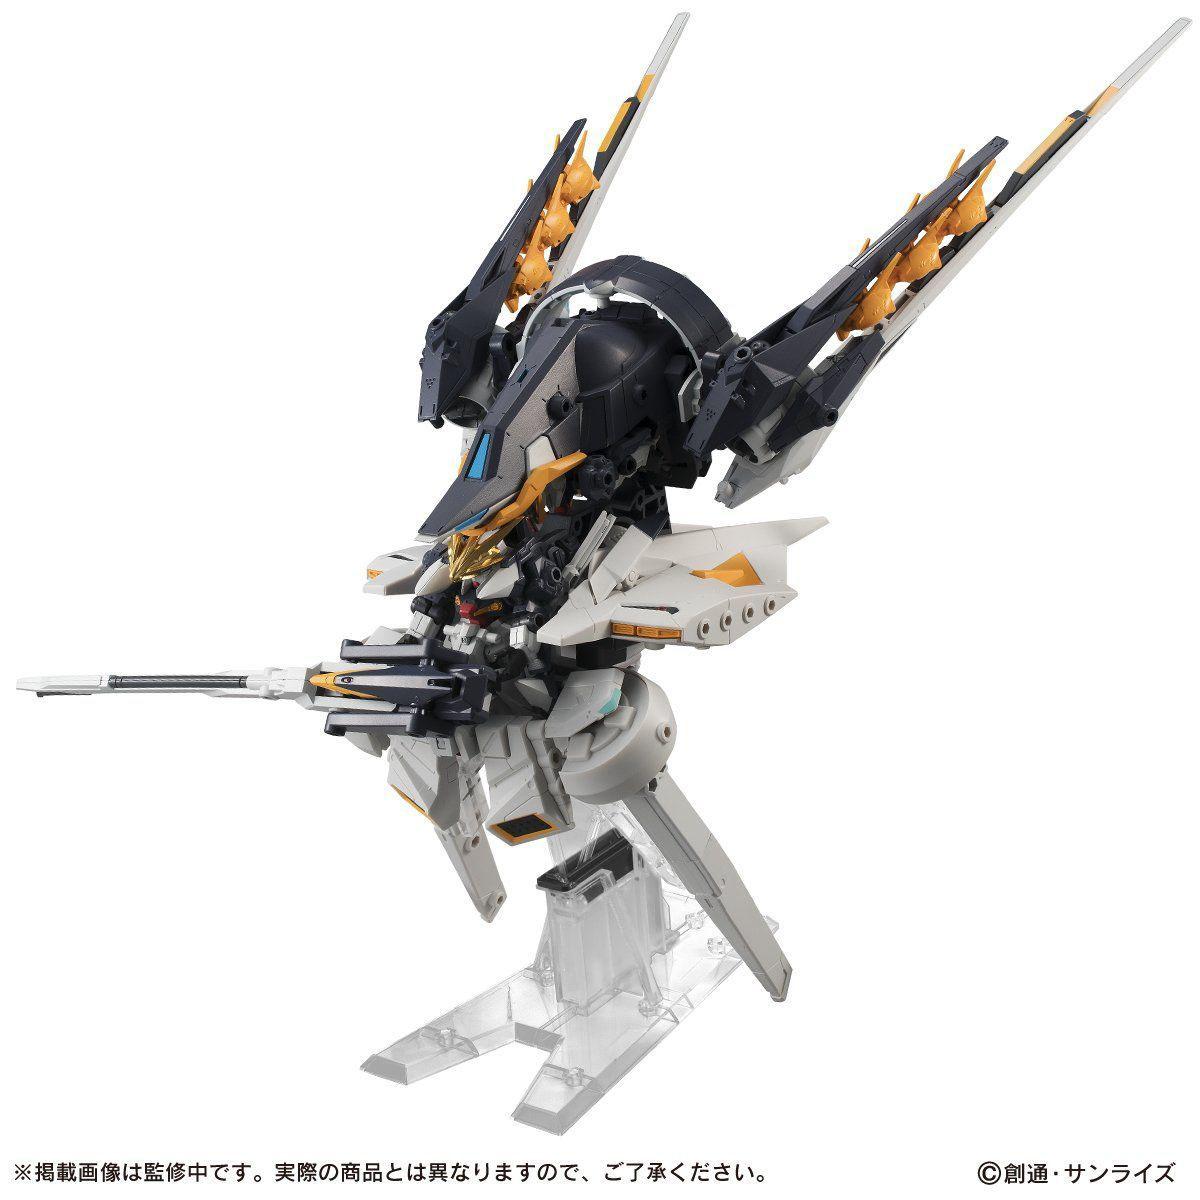 MOBILE SUIT ENSEMBLE EX09『TR-6 インレ』デフォルメ・フィギュア-004